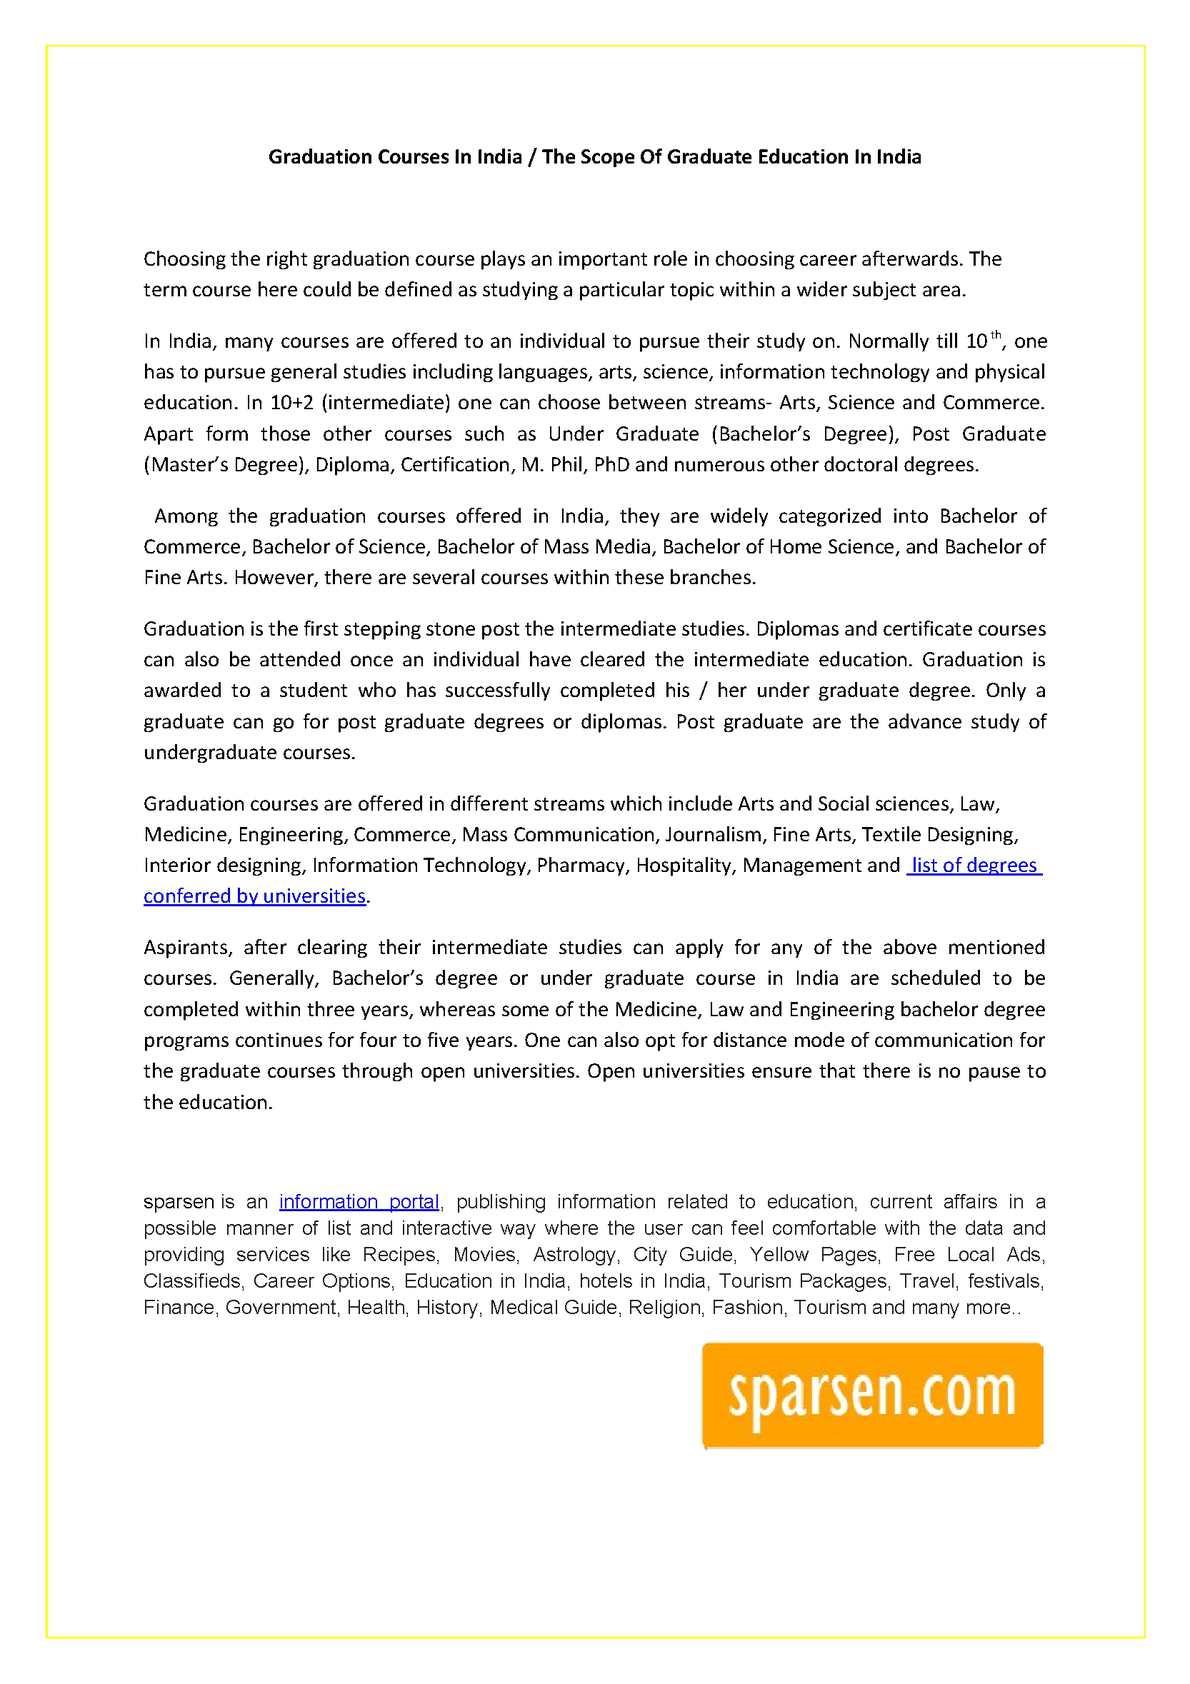 Calameo The Scope Of Graduate Education In India